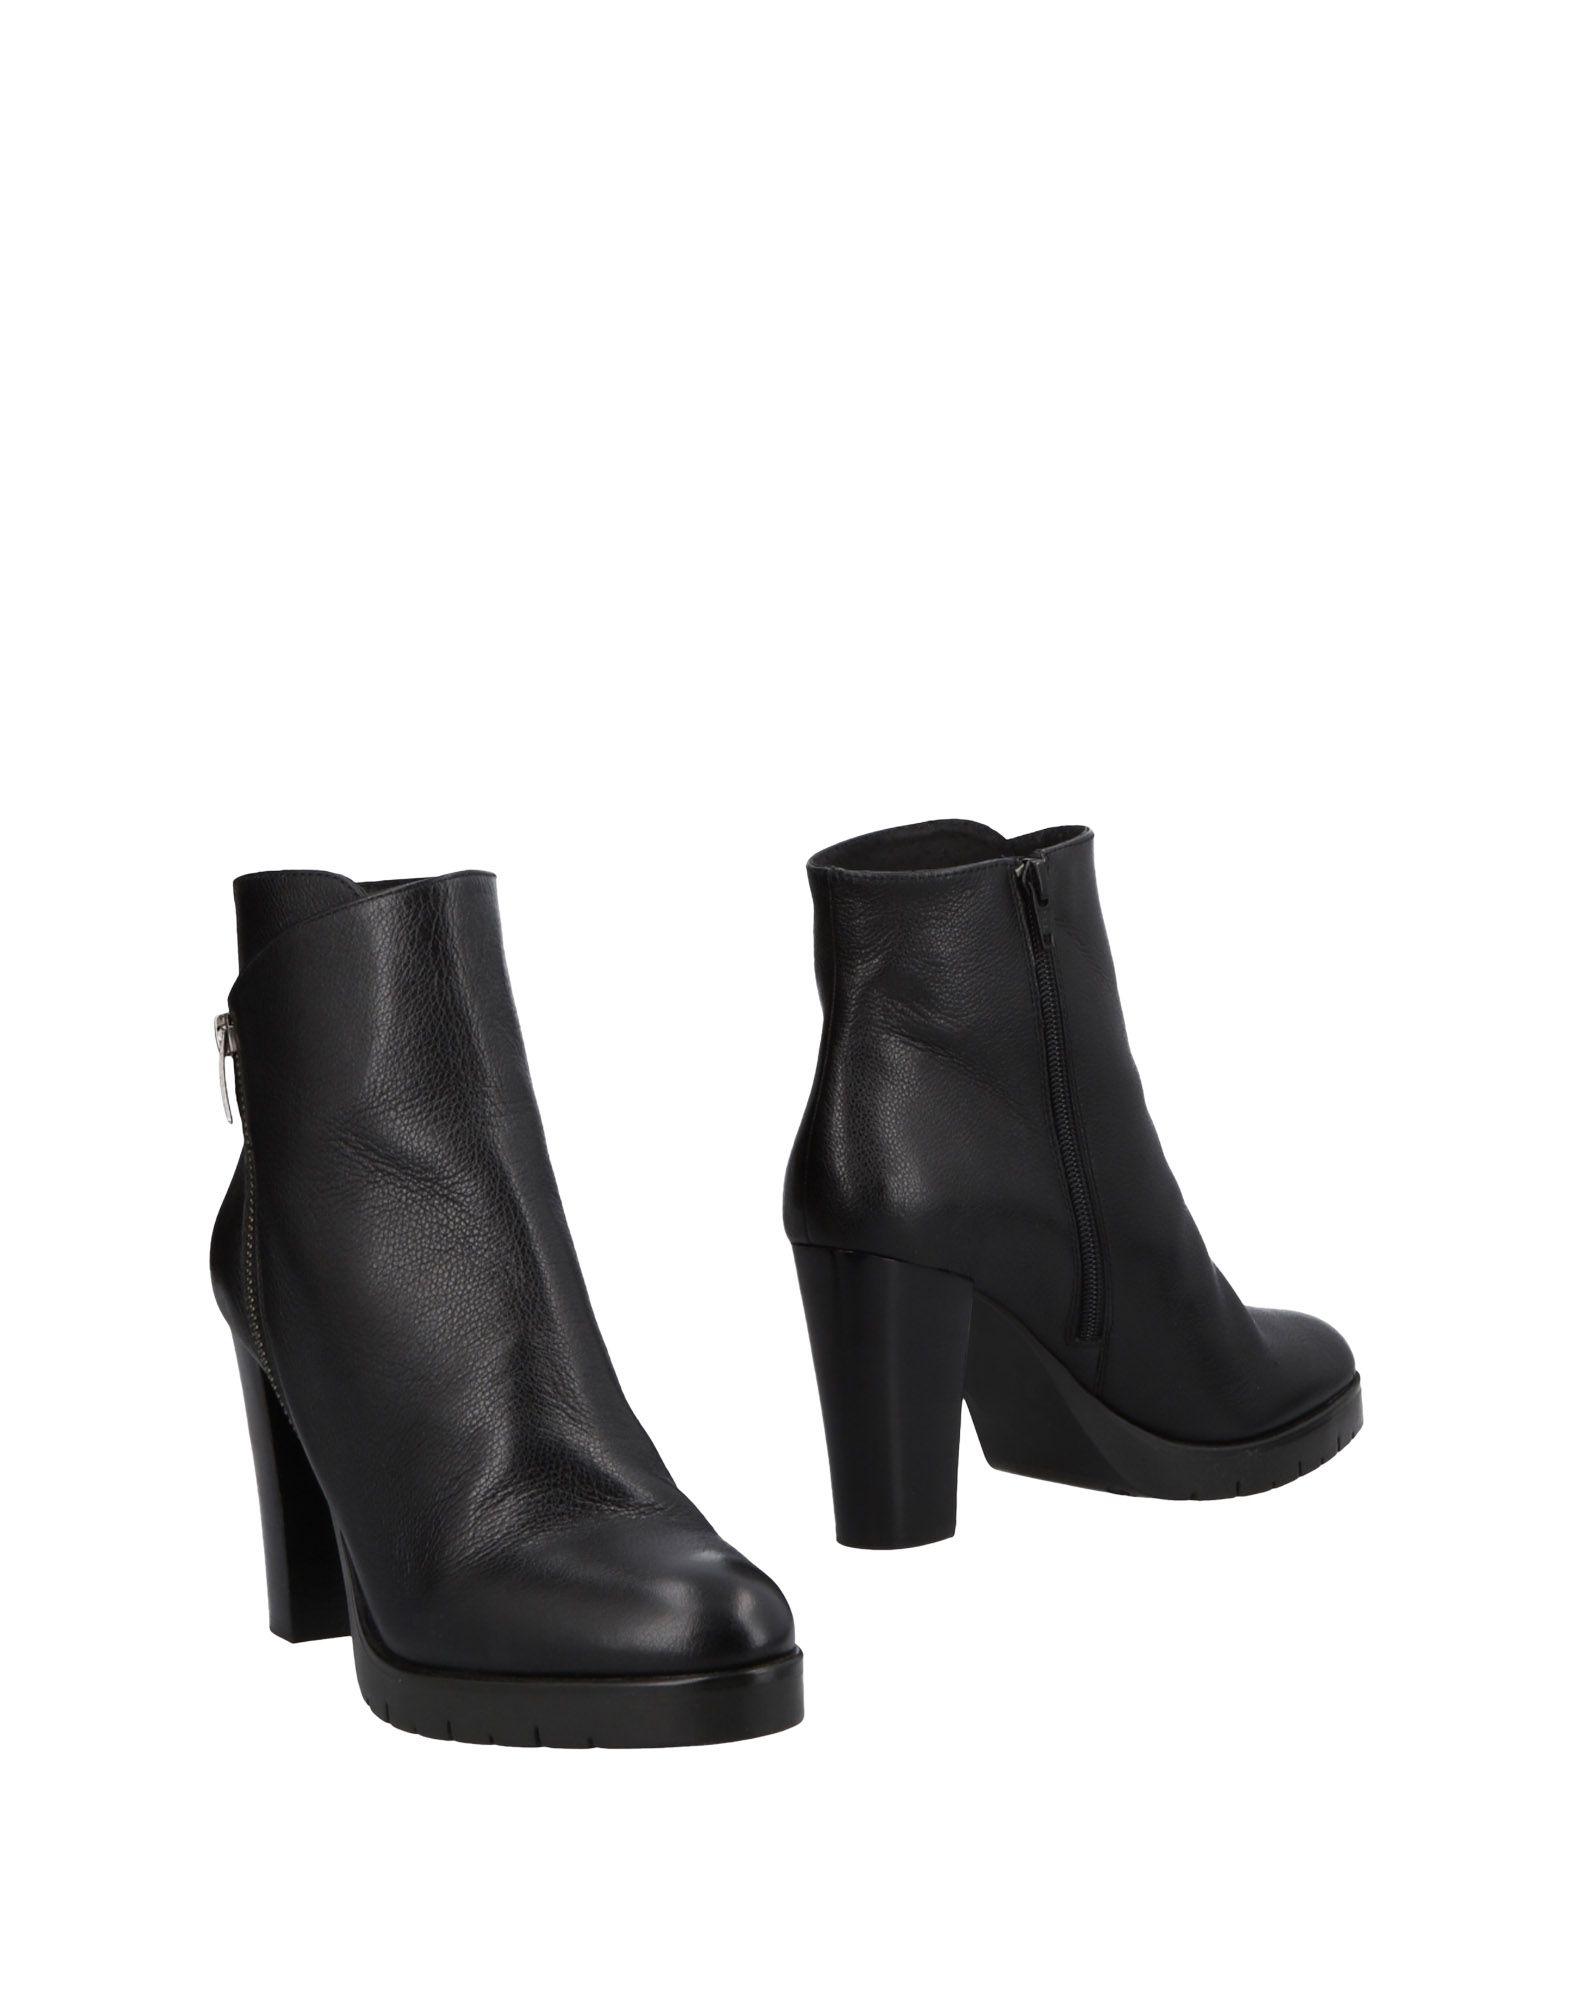 Cuoieria Stiefelette Damen beliebte  11483382DW Gute Qualität beliebte Damen Schuhe fadc4d